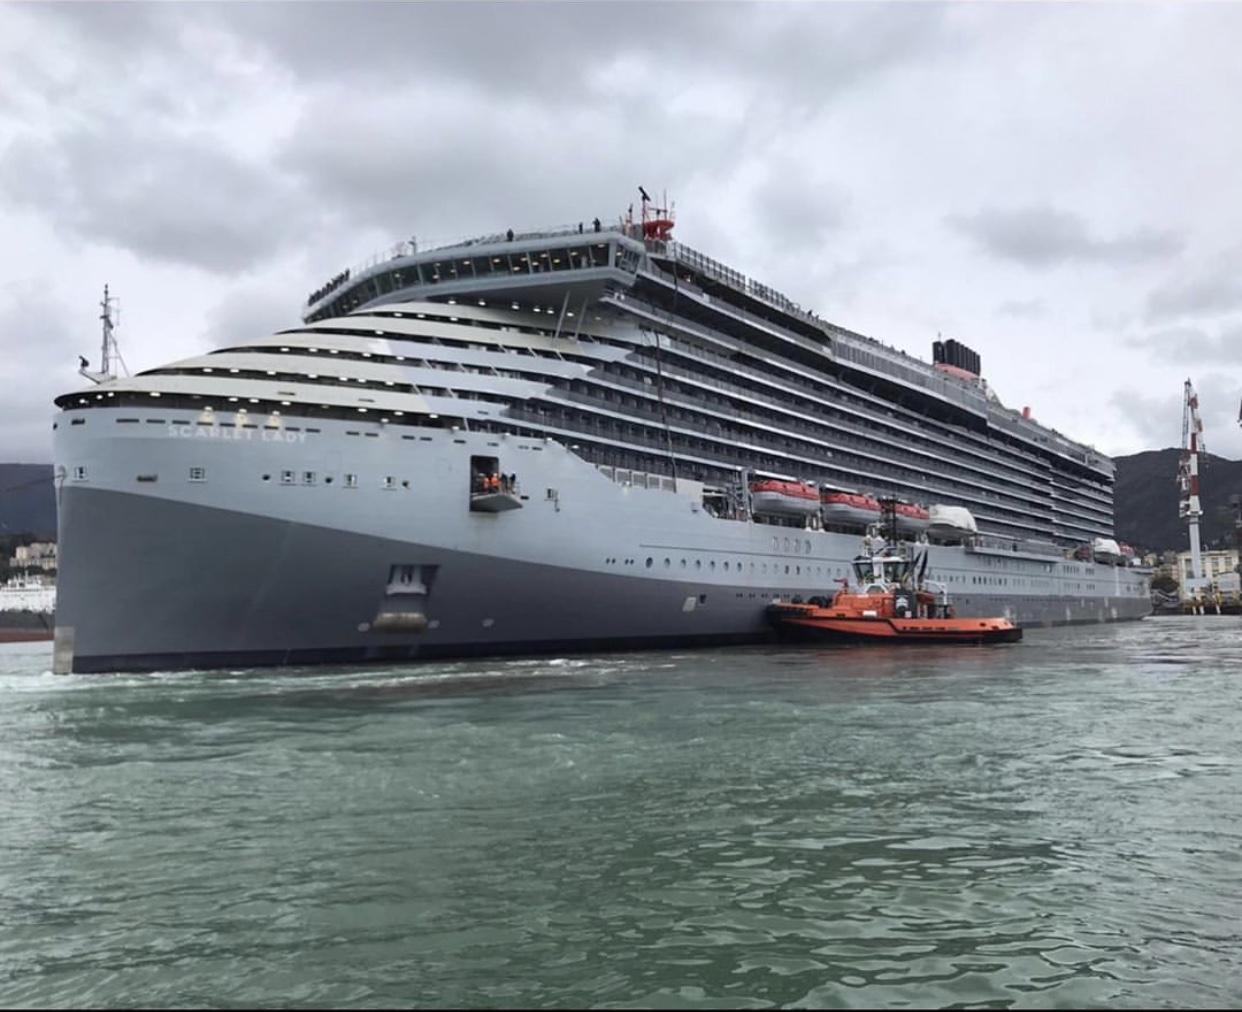 Virgin Voyages Scarlet Lady leaves shipyard in Genoa for sea trials